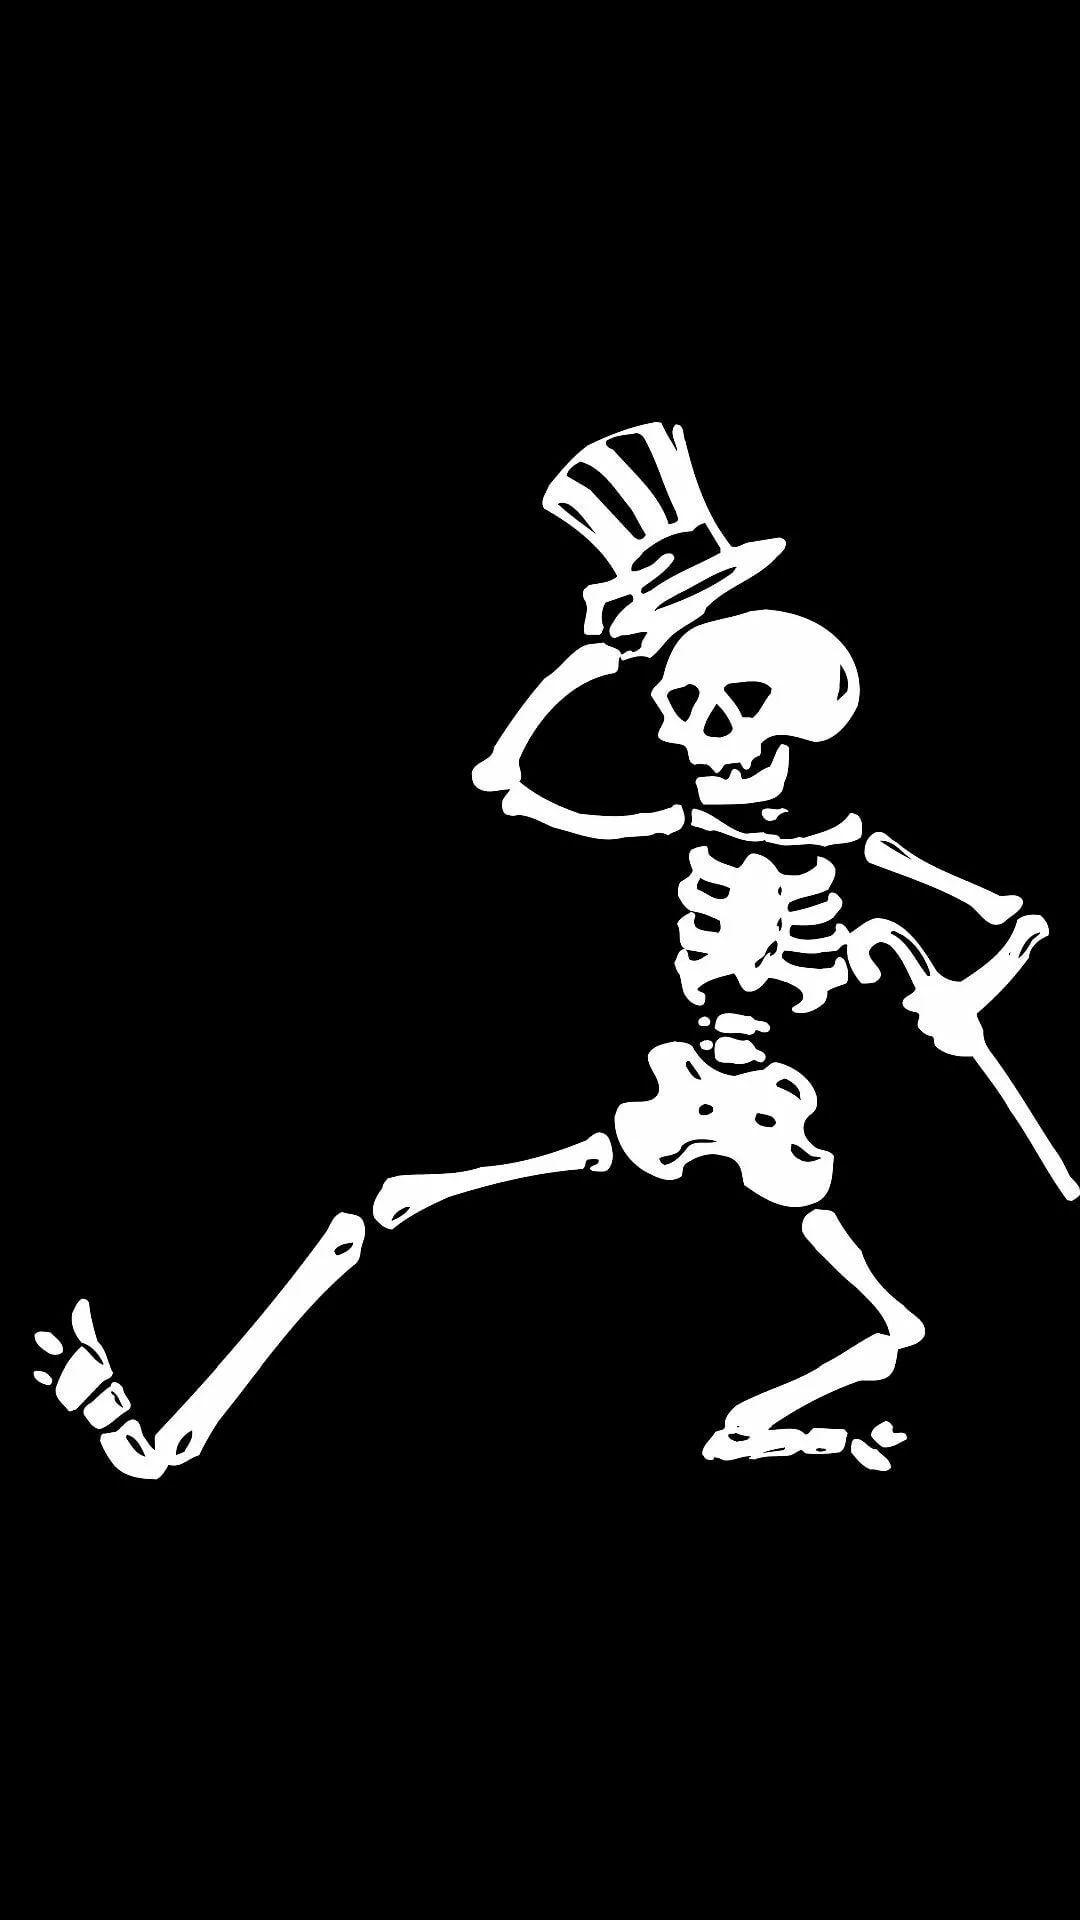 Skeleton iPhone xs max wallpaper